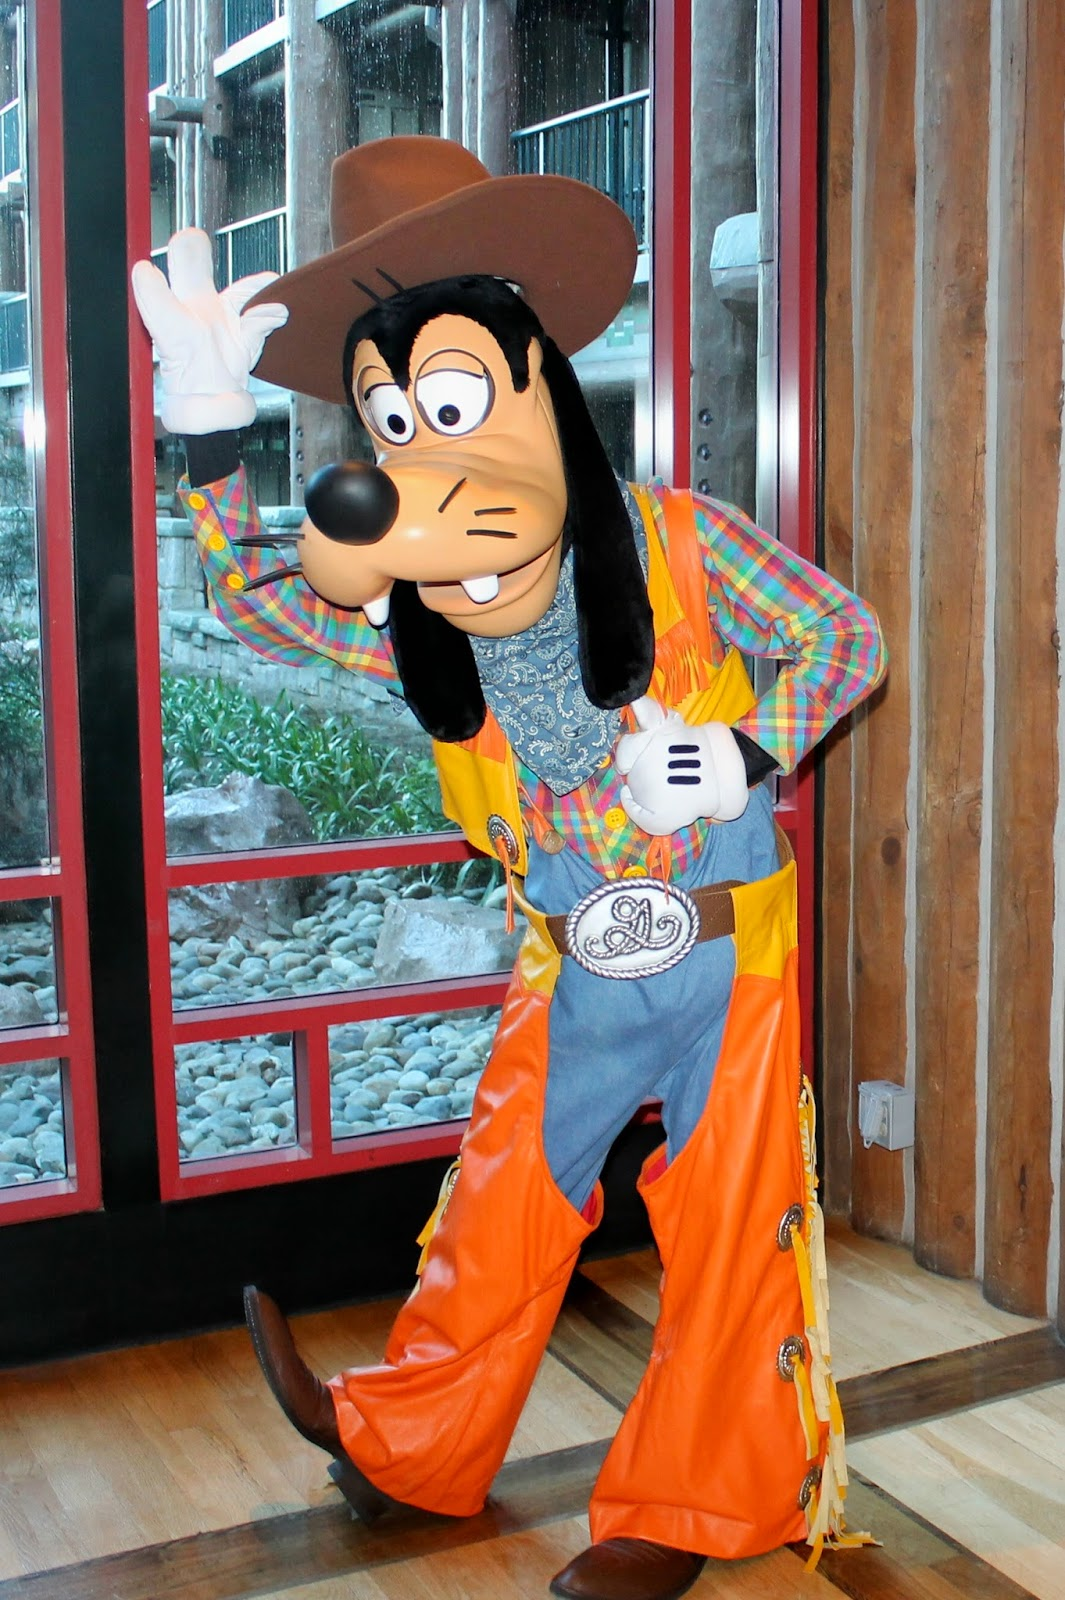 Goofy Cowboy Halloween Disney character Hunt Wilderness Lodge